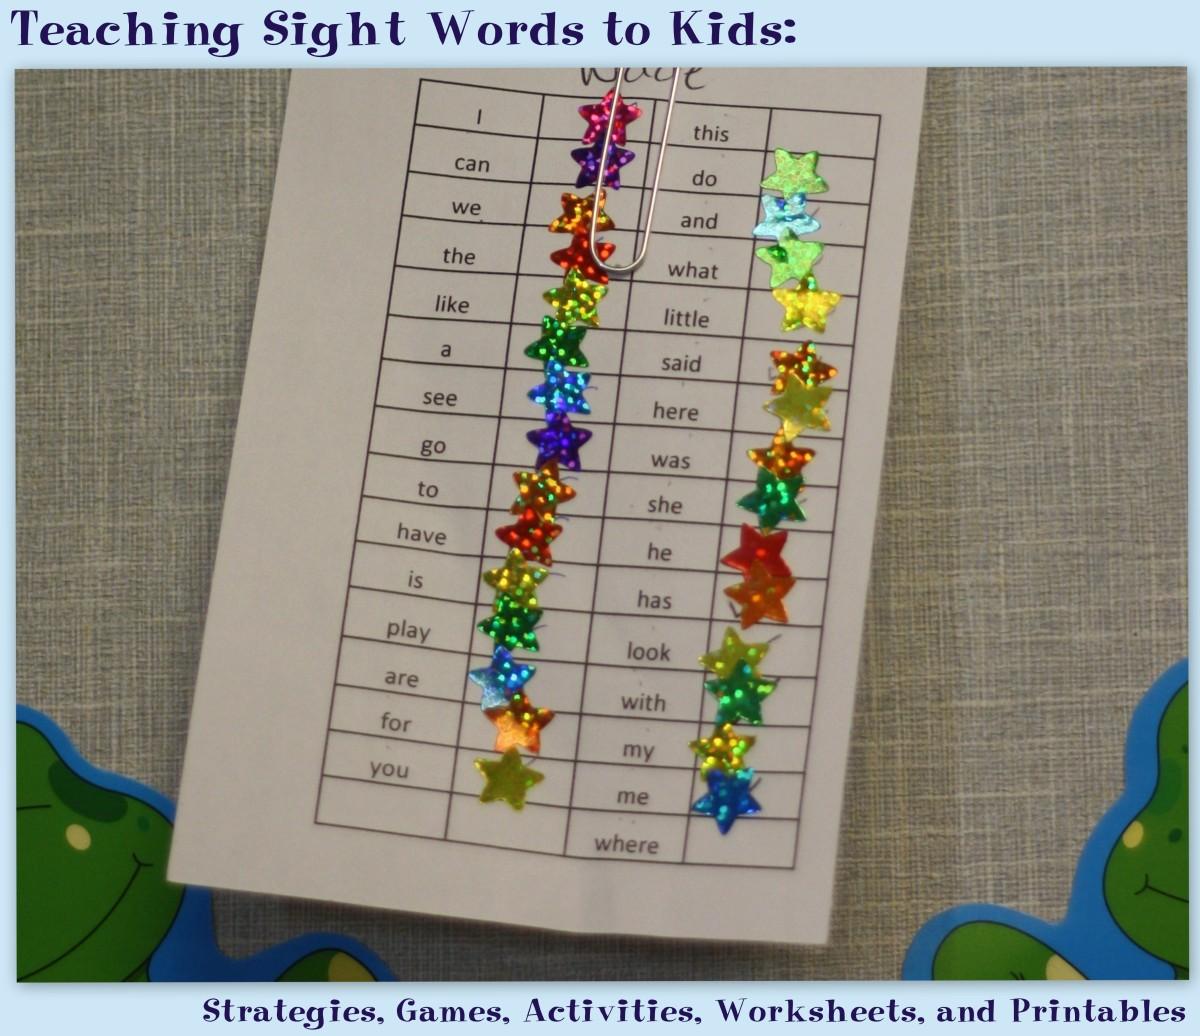 Teaching Sight Words To Kids Strategies Games